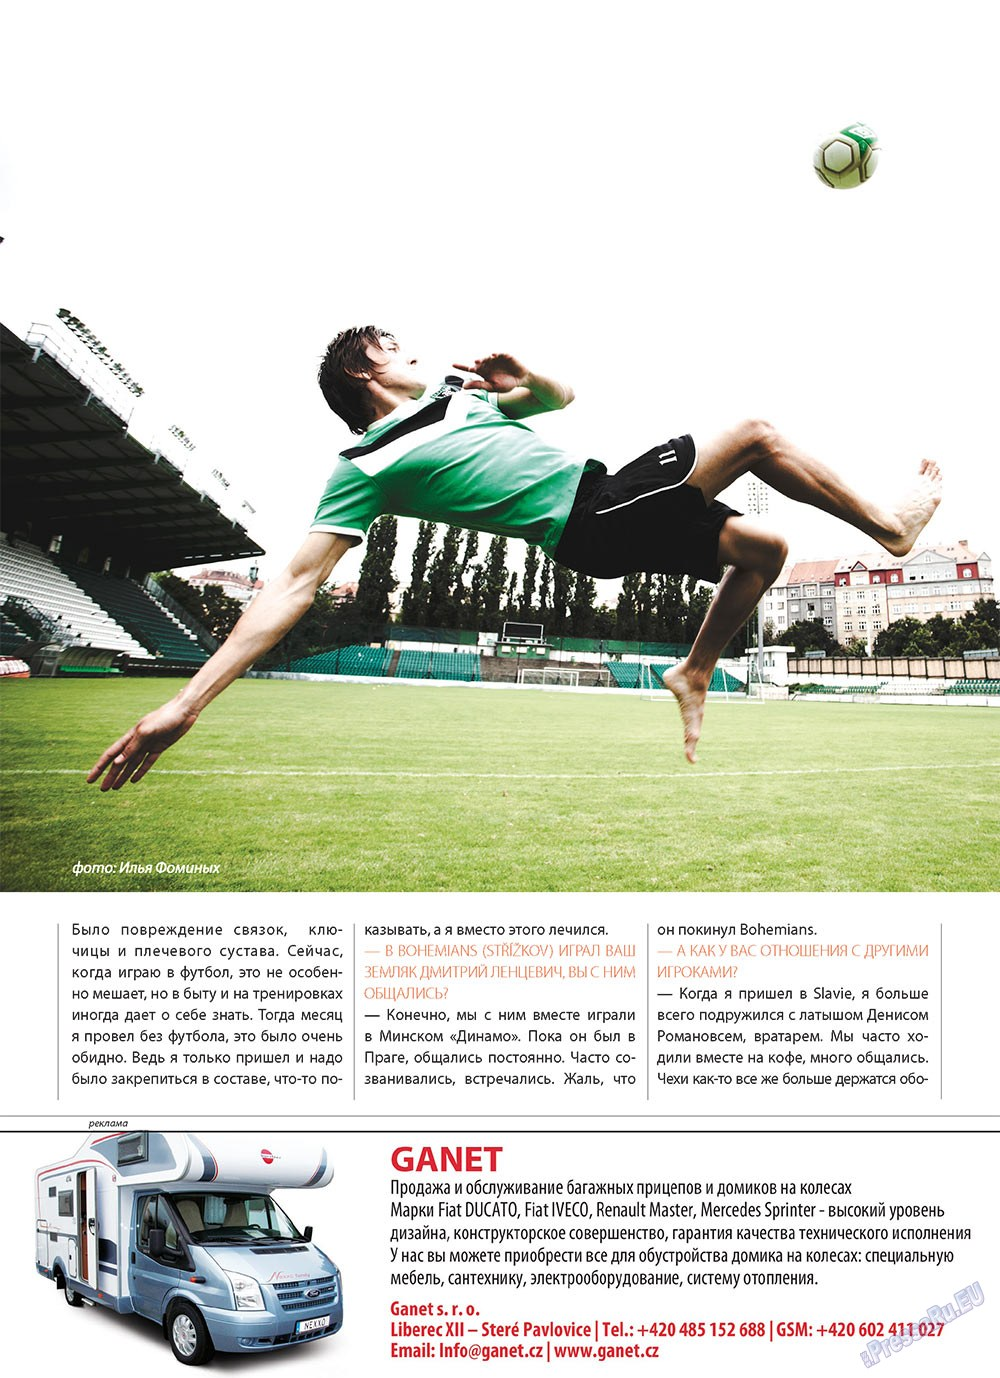 Артек (журнал). 2010 год, номер 4, стр. 28